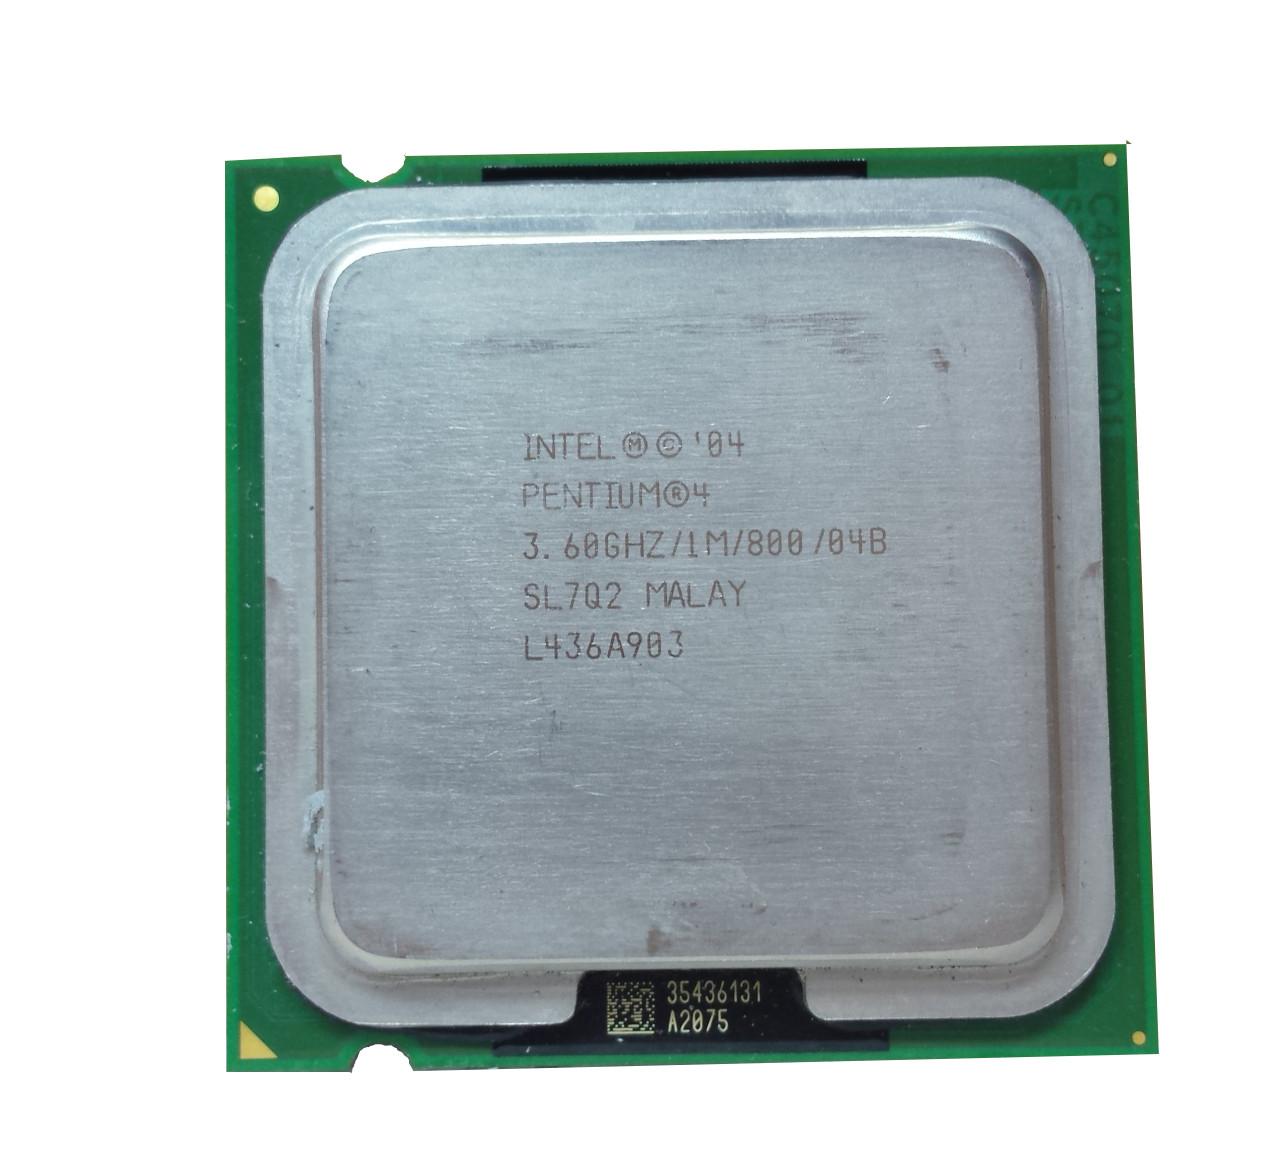 Процессор Intel Pentium 4 560 3.60GHz/1M/800 (SL7Q2) s775, tray